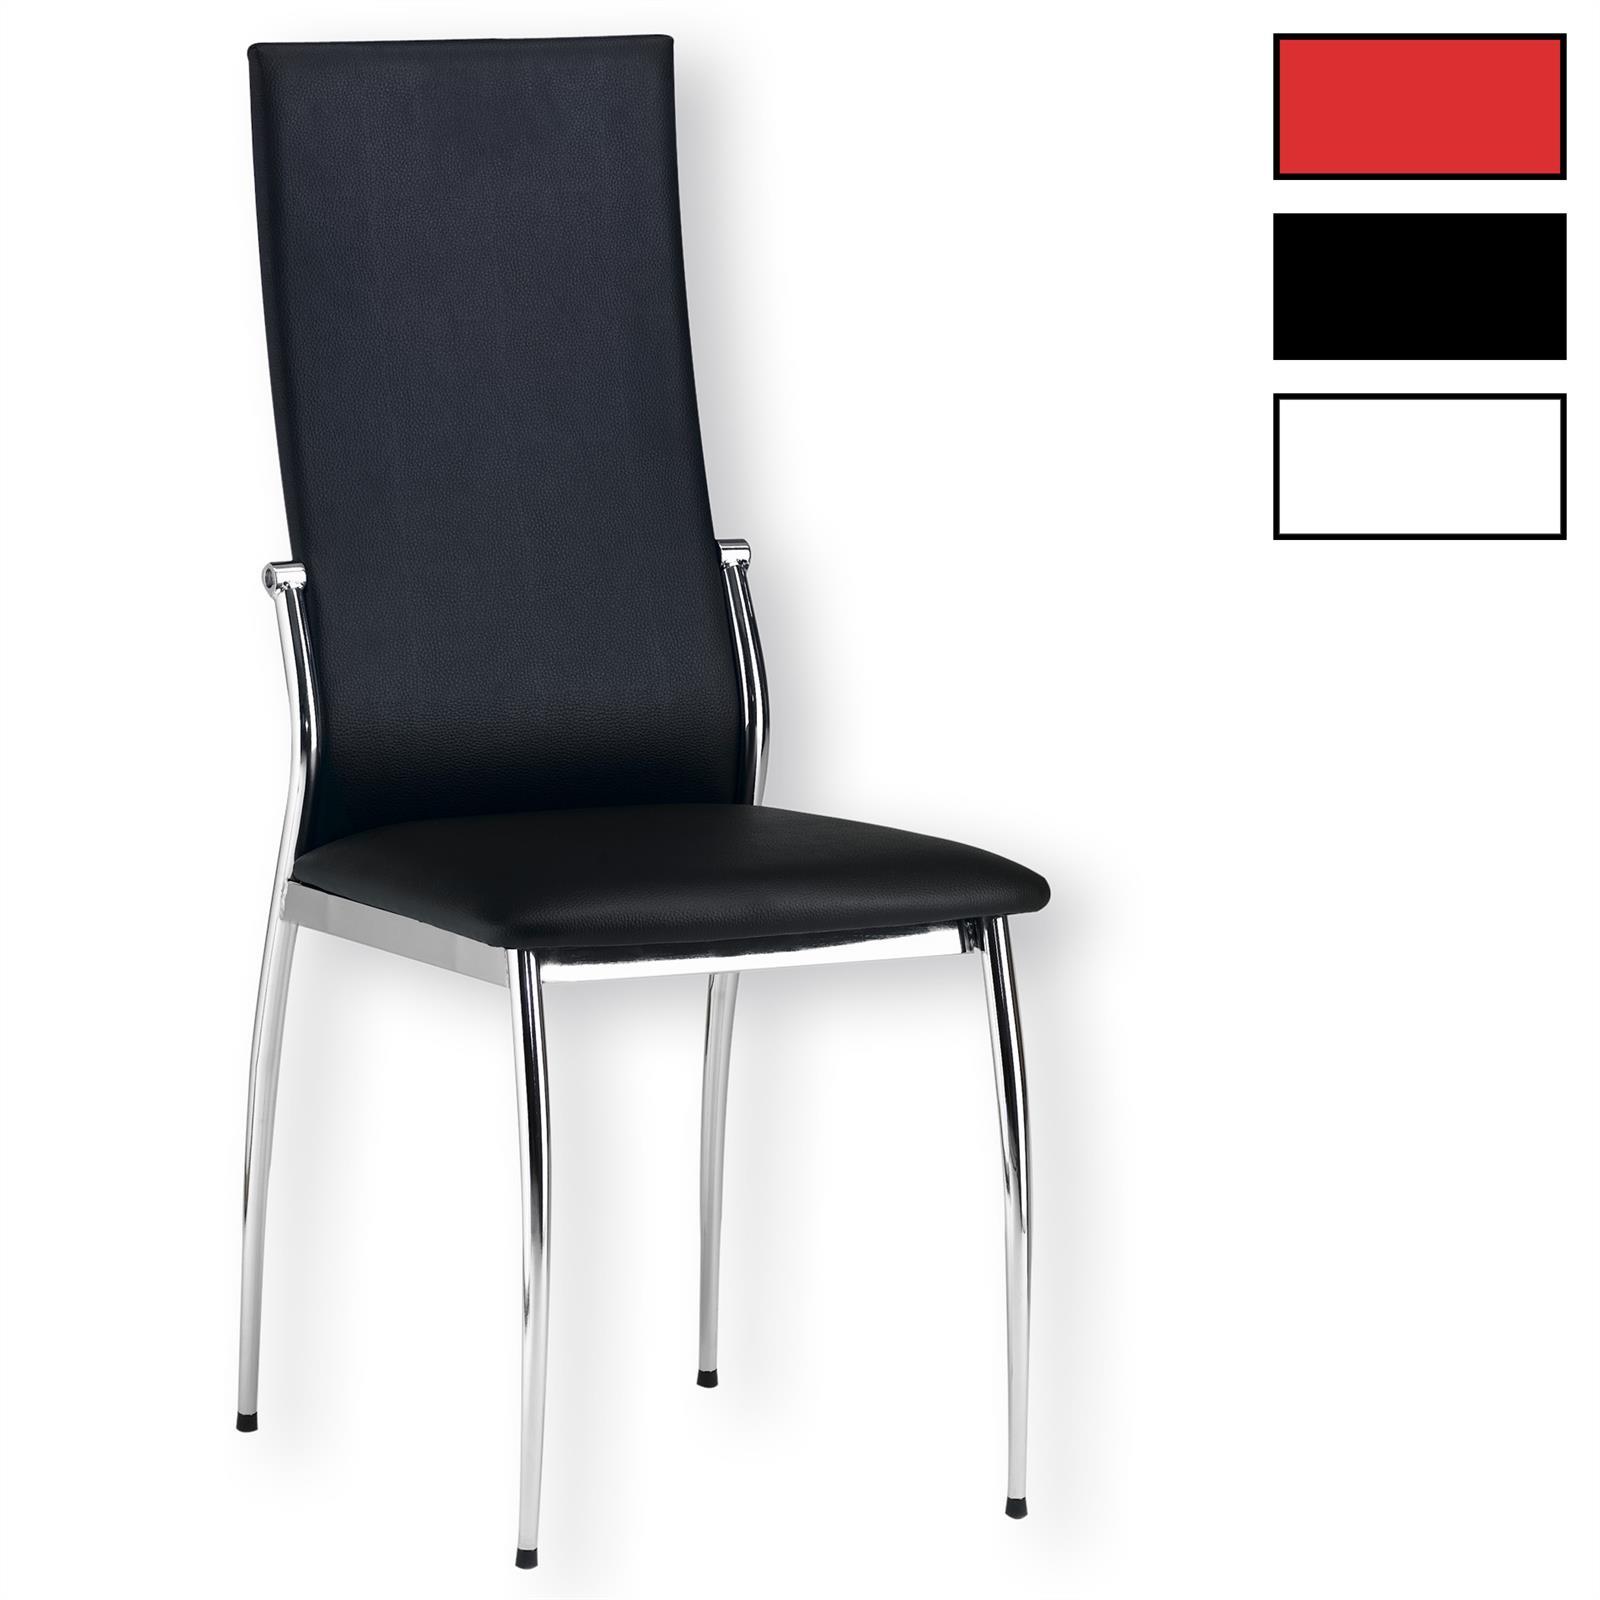 Esszimmer Stuhl DORIS verschiedene Farben  mobilia24